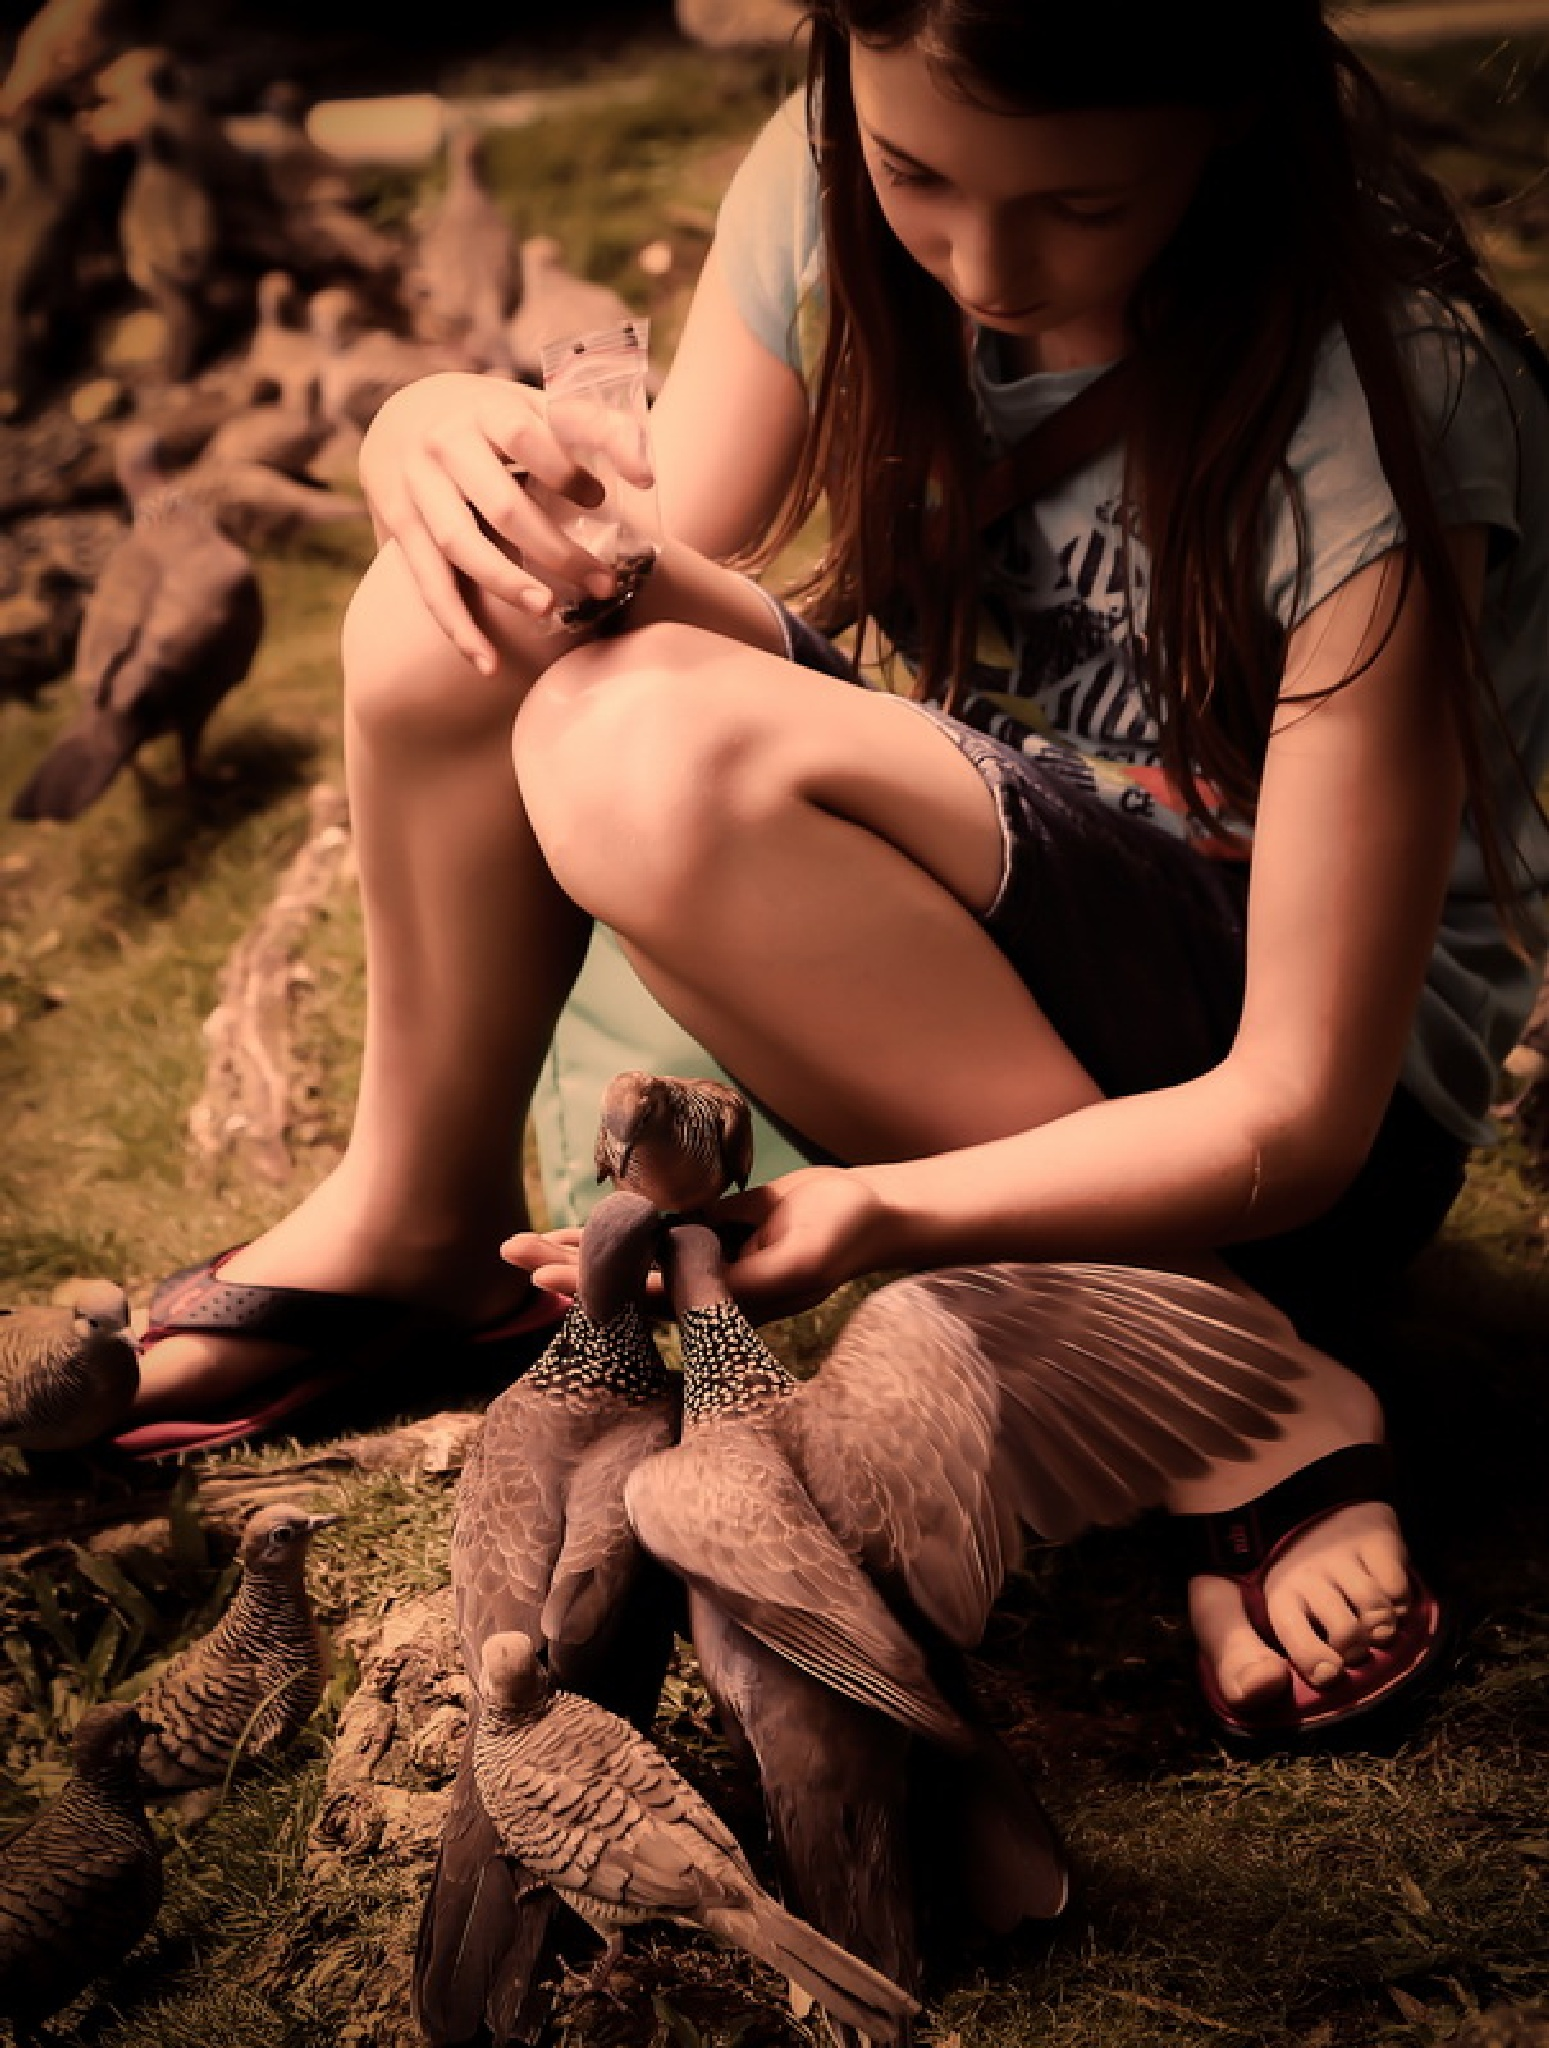 in Hawaii by volkhard sturzbecher